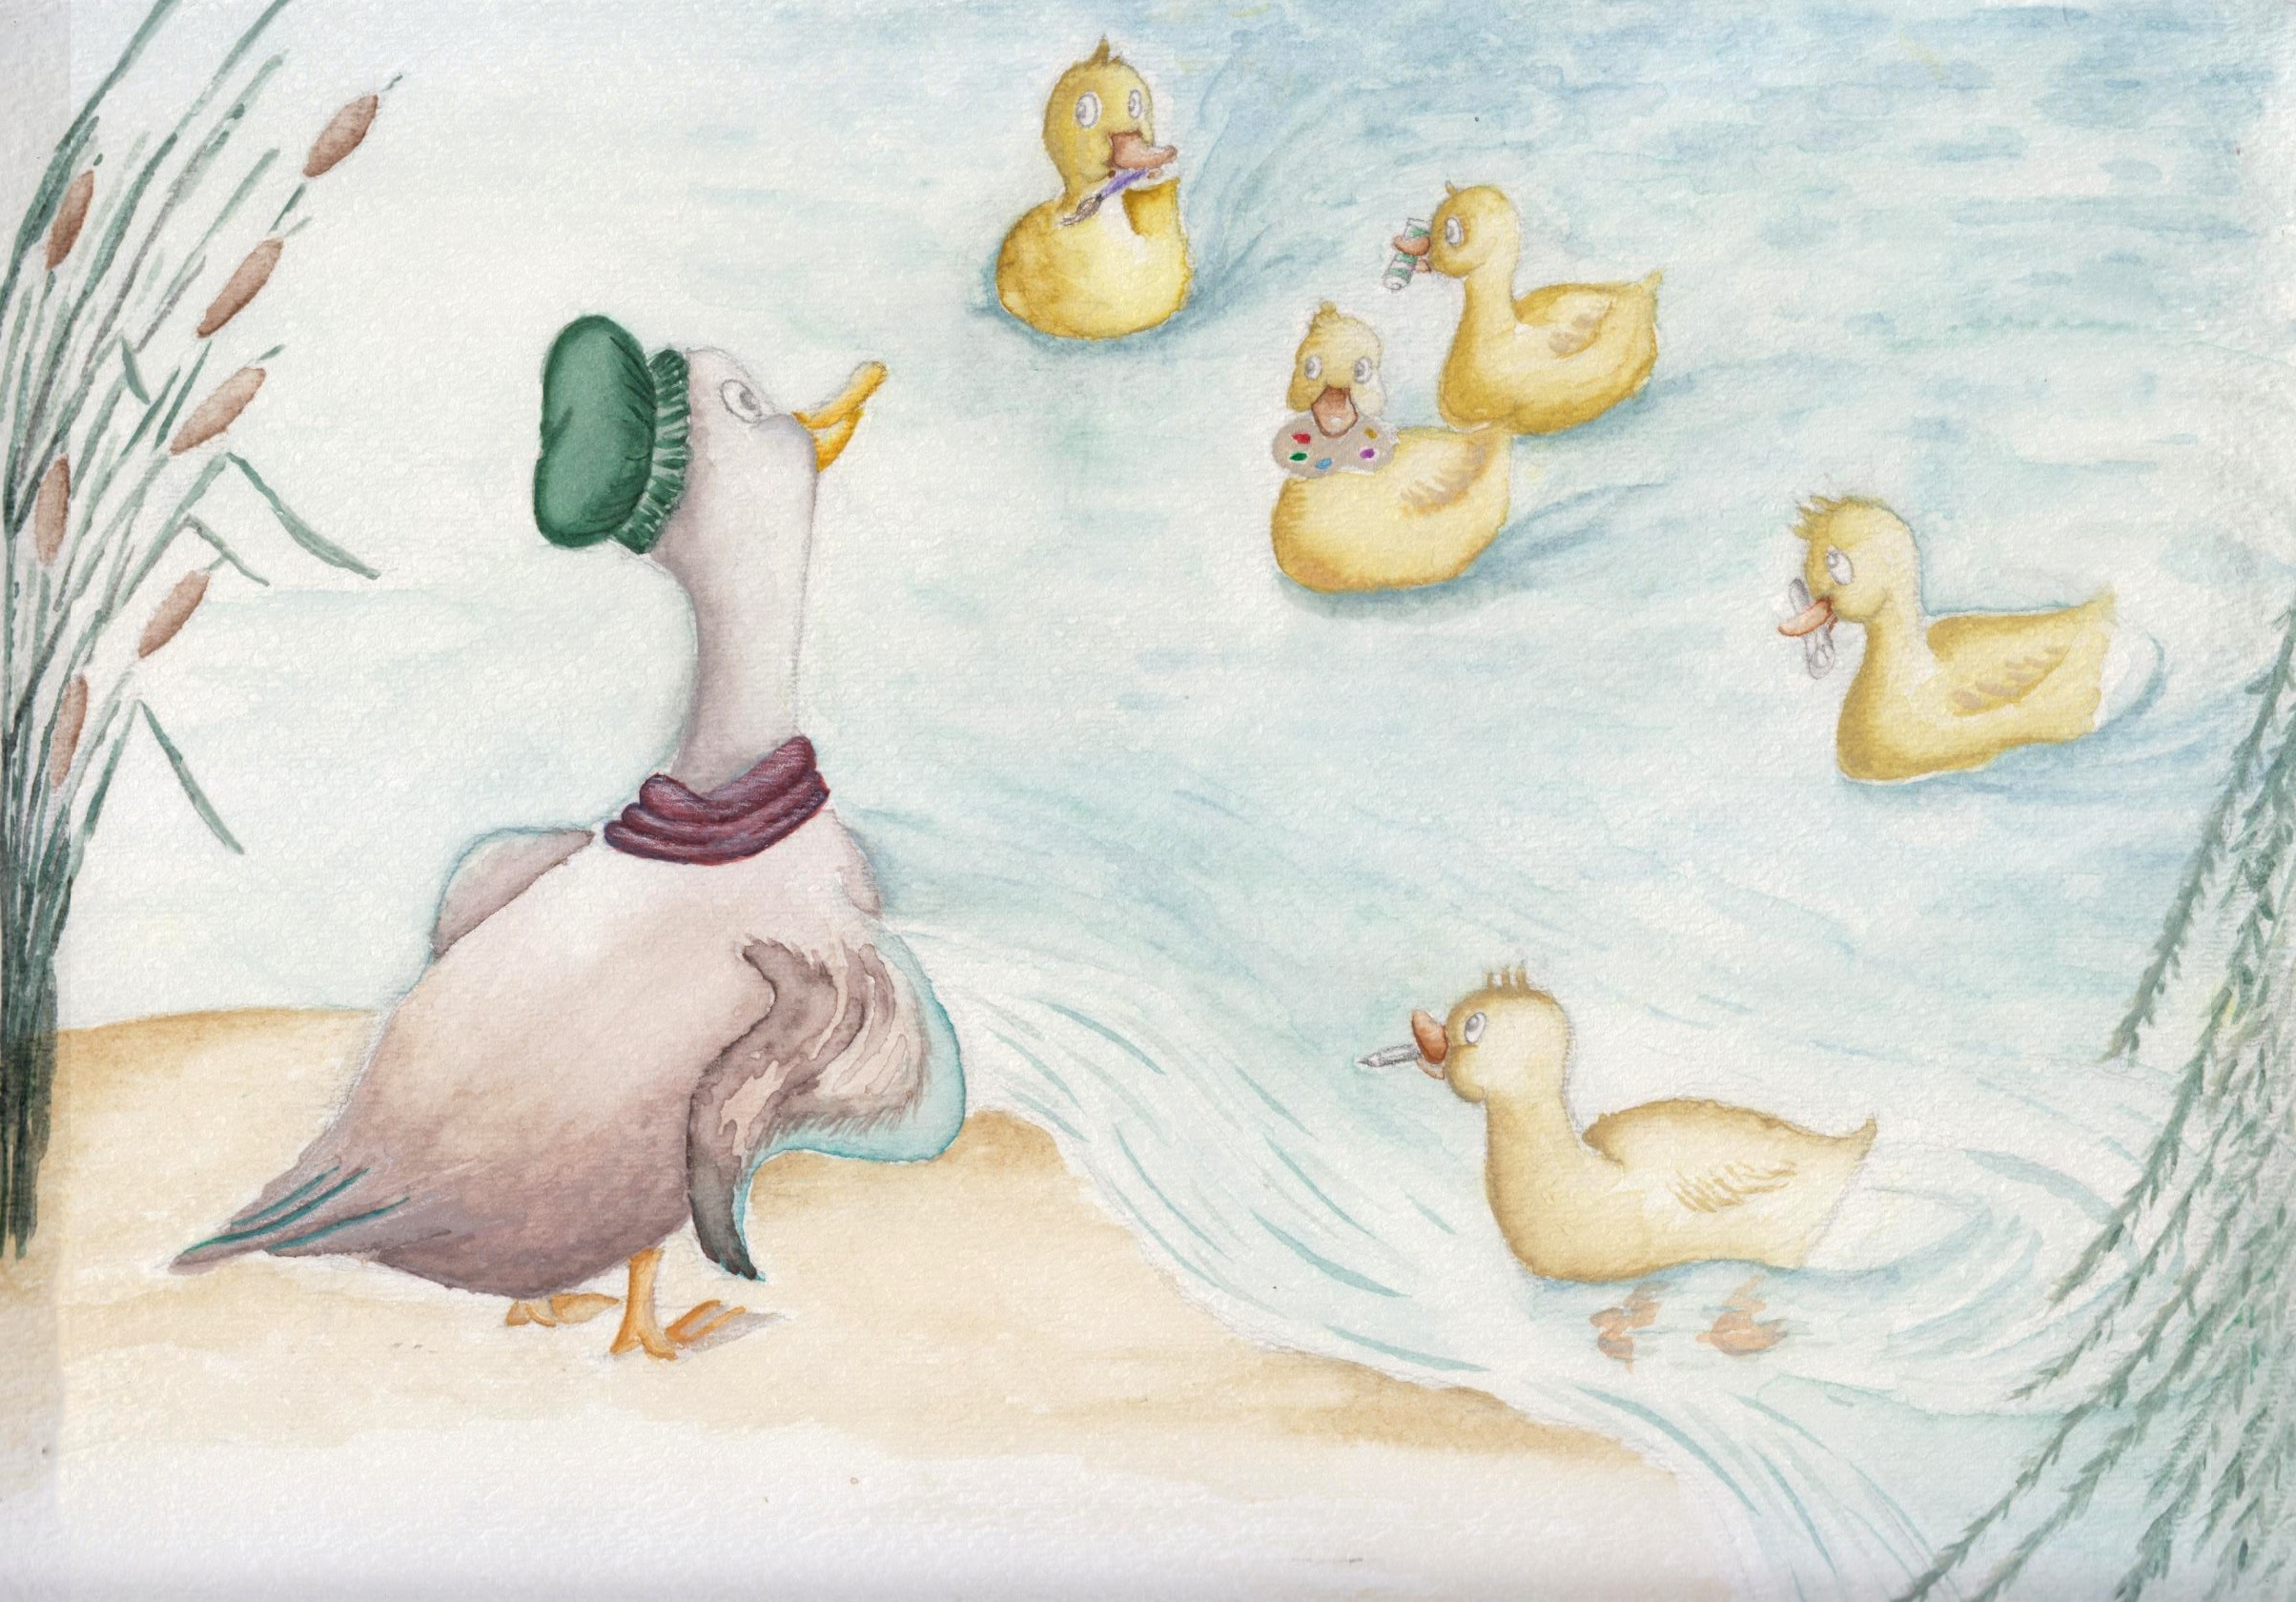 Five Little Ducks, revisited